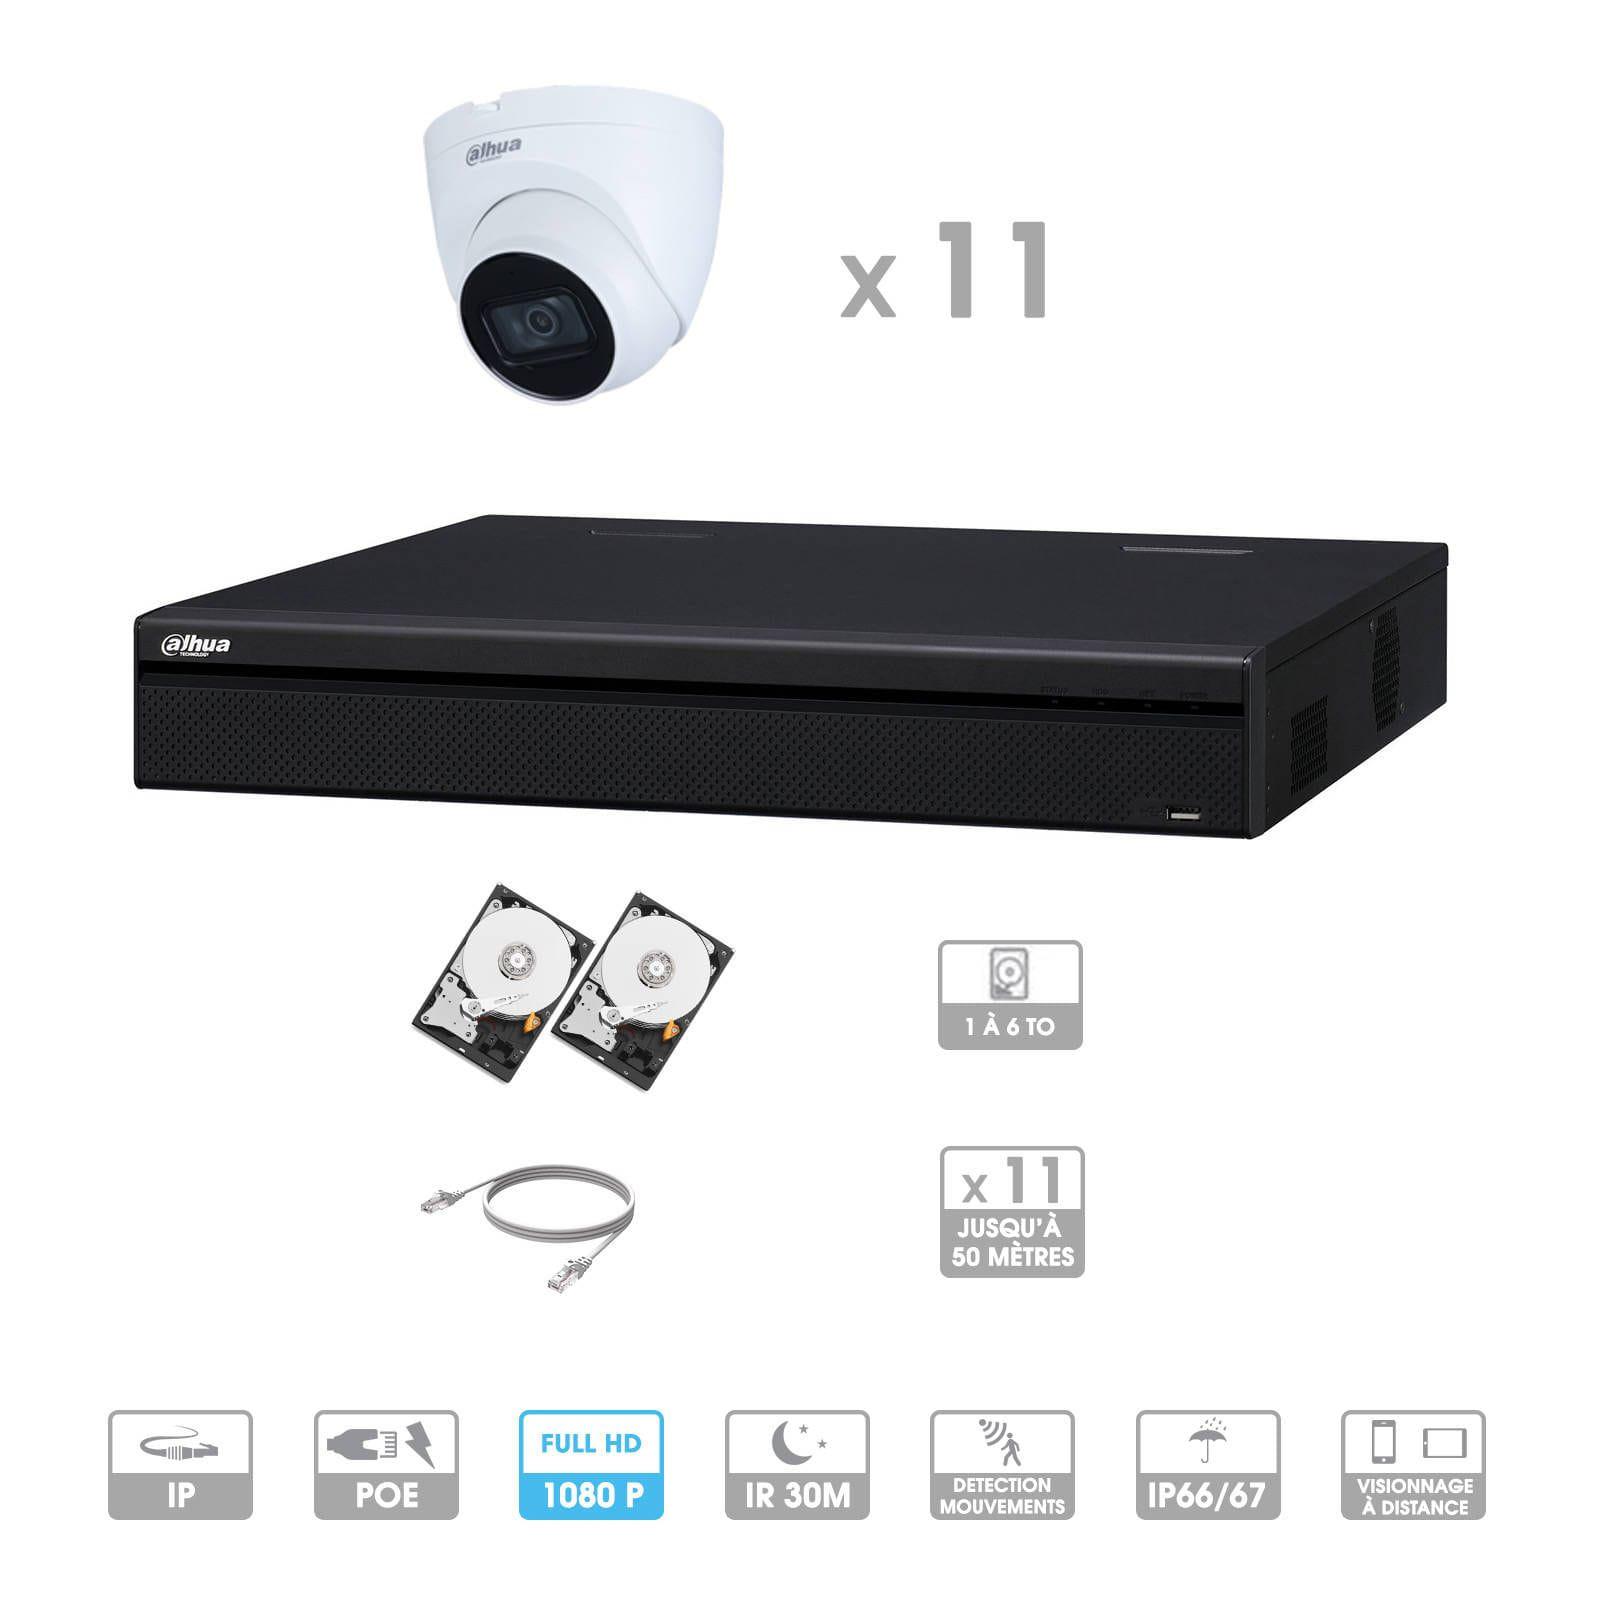 Kit vidéosurveillance 11 caméras | 2 MP | IP PoE | 11 câbles RJ45 20/30/40/50 mètres | 2 HDD 1 à 6 To | Dôme Dahua